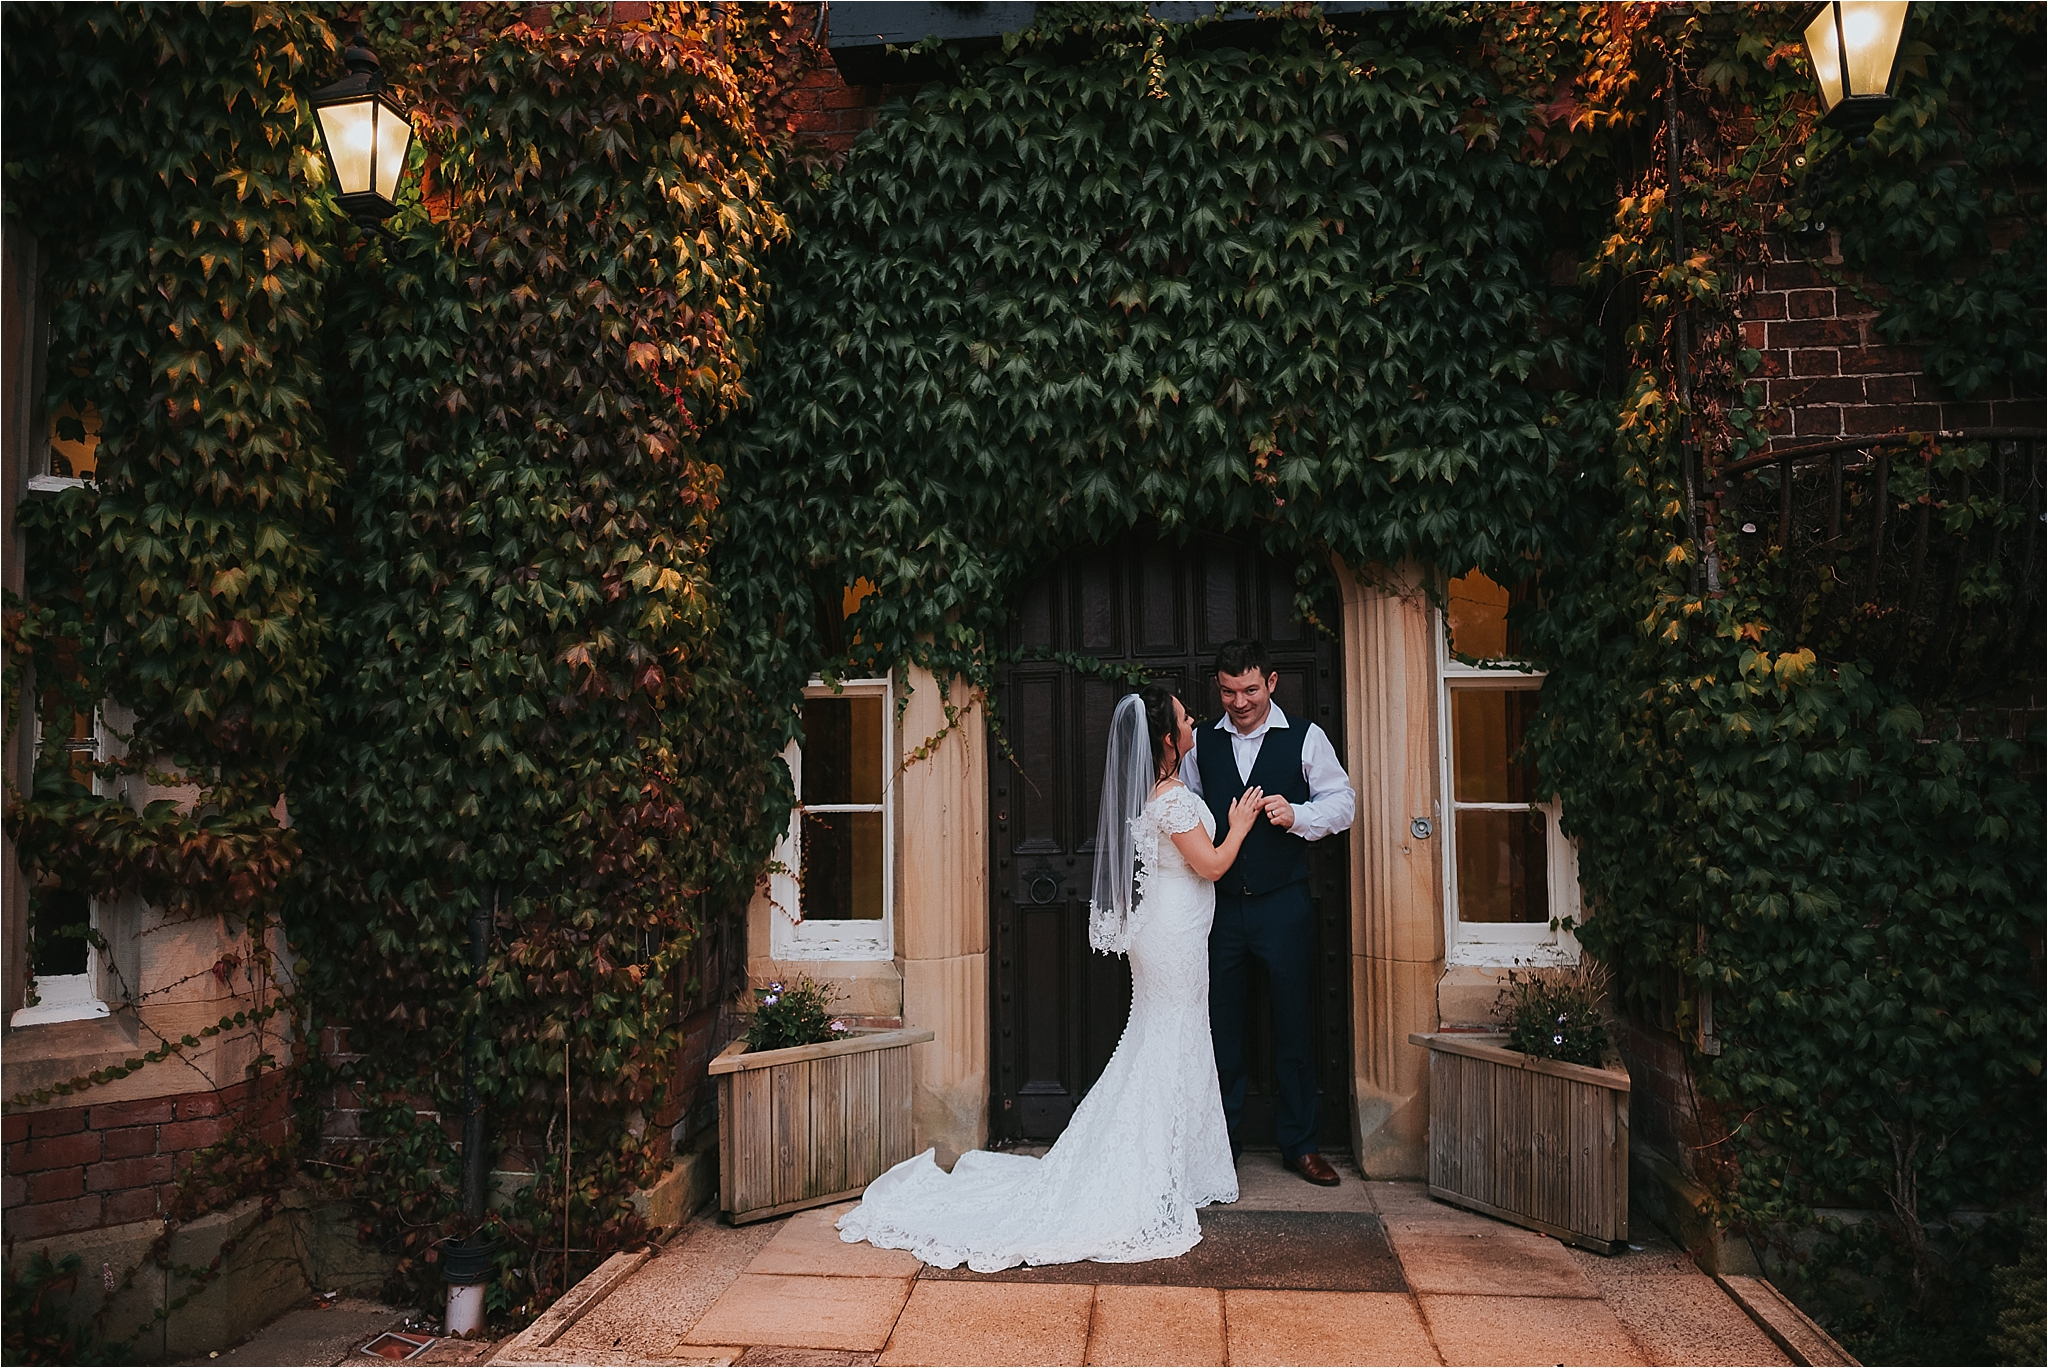 thevilla+lancashire+wreagreen+wedding+photographer112.jpg